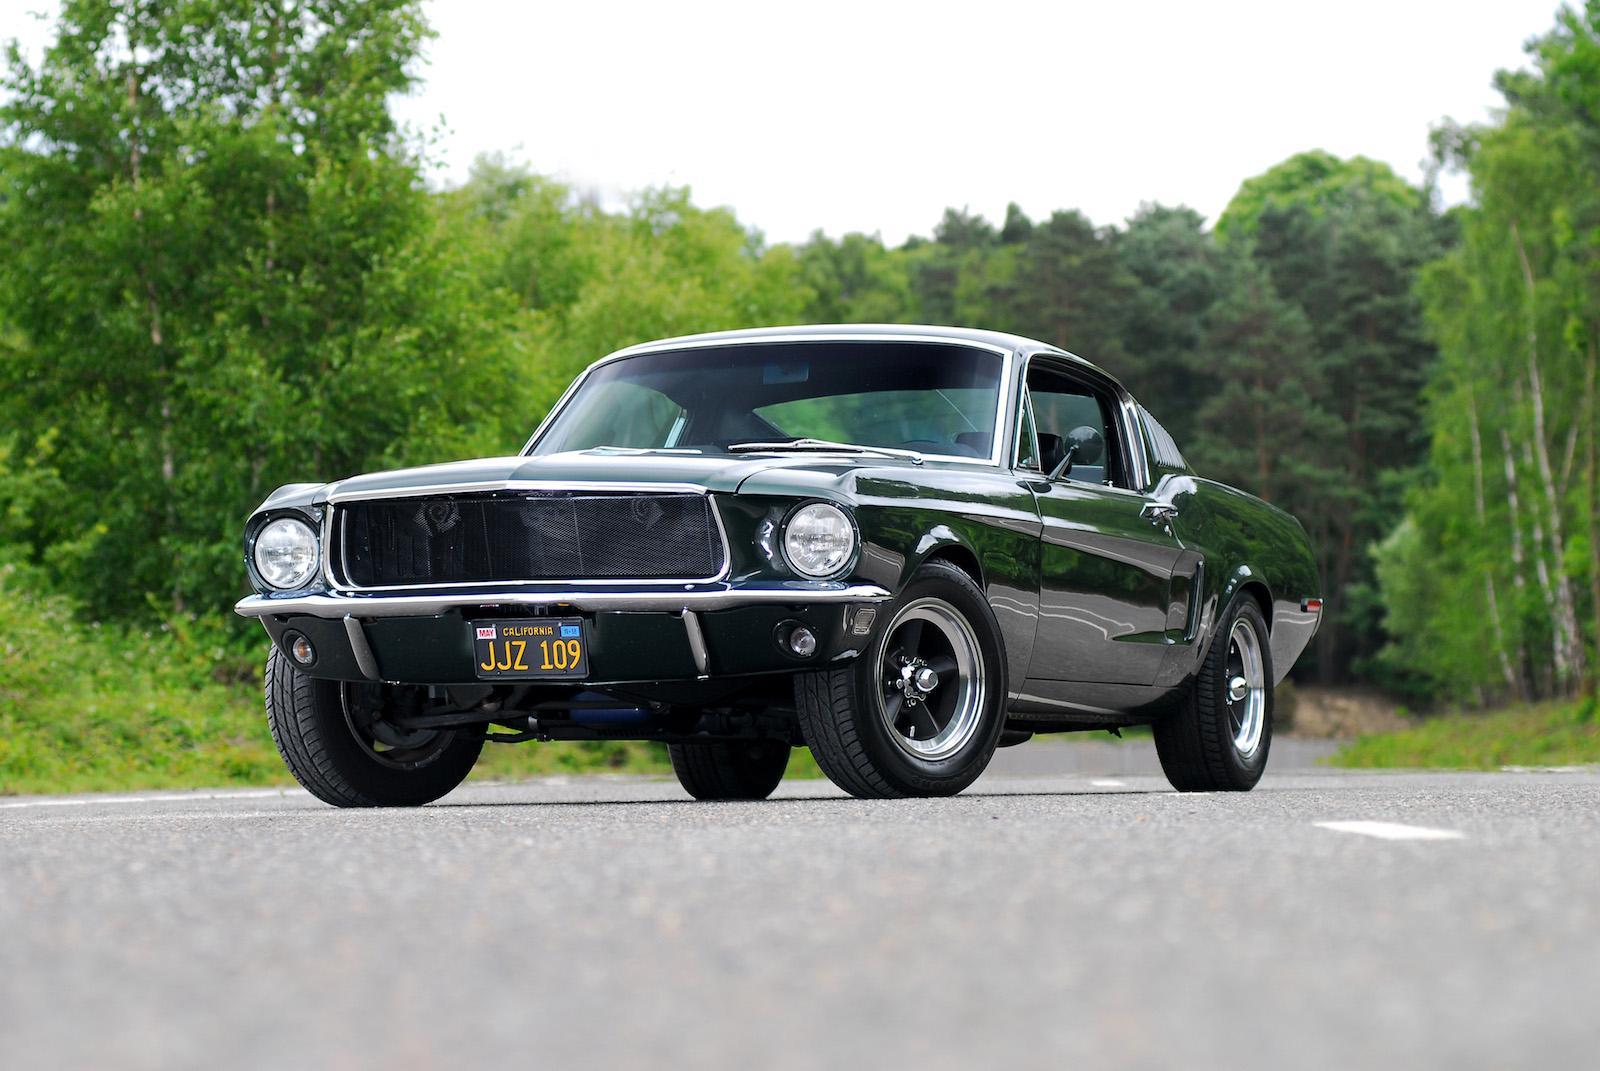 Top 10 Movie Cars | Autoclassics.com